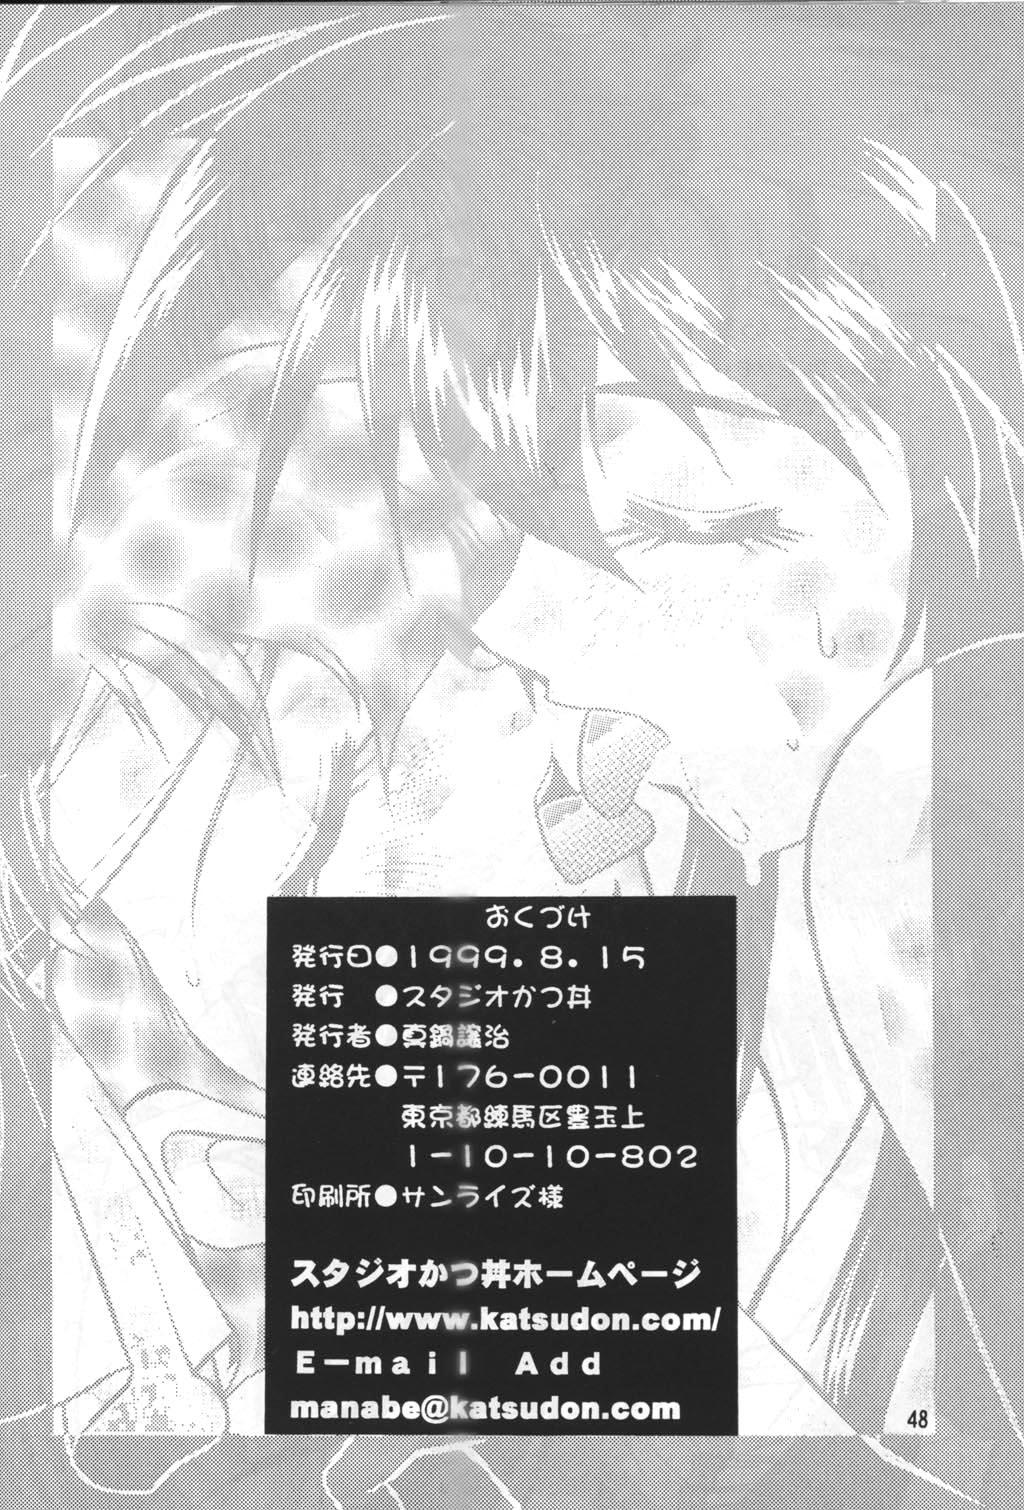 (C65) [Studio Katsudon] Imasara Dirty Pair Yuri Special (Dirty Pair)[English]-[tekitousanEX+Super Shanko] 44